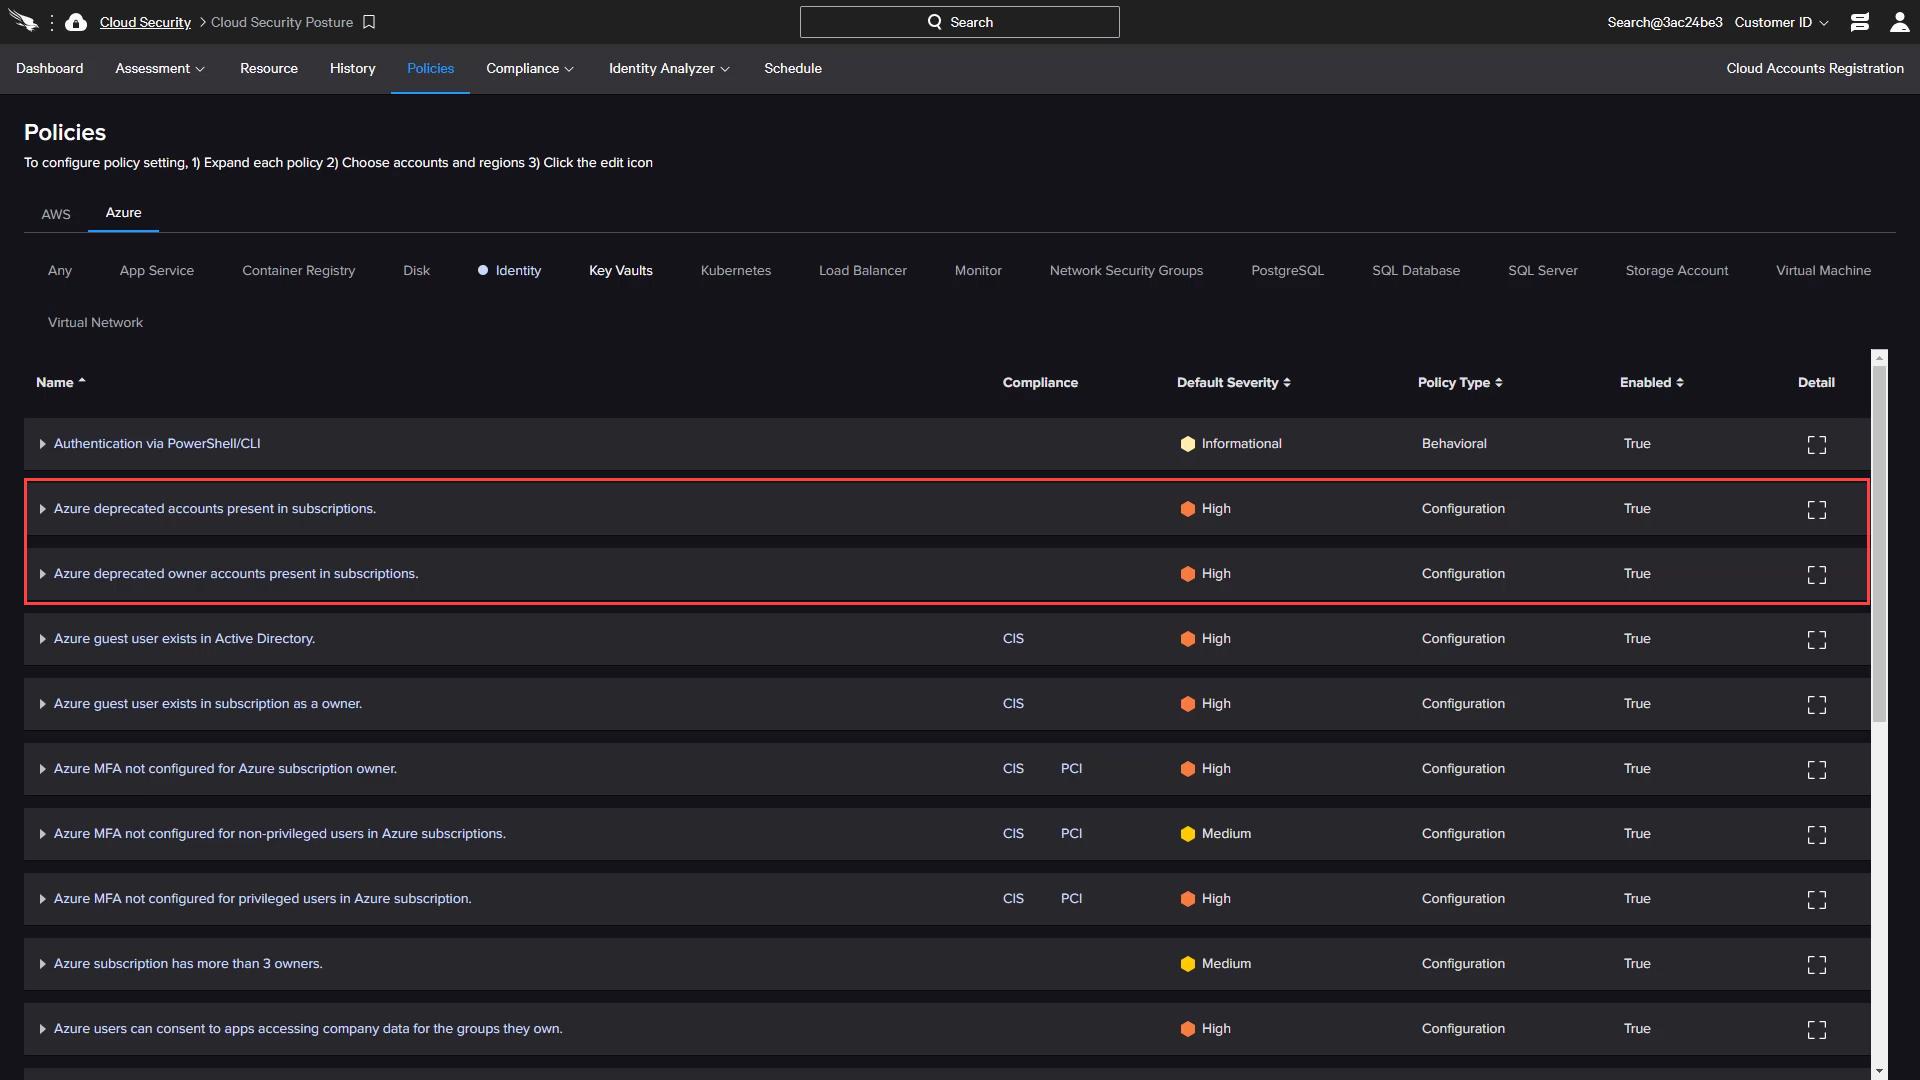 CSPM Azure Identity Deprecated Accounts